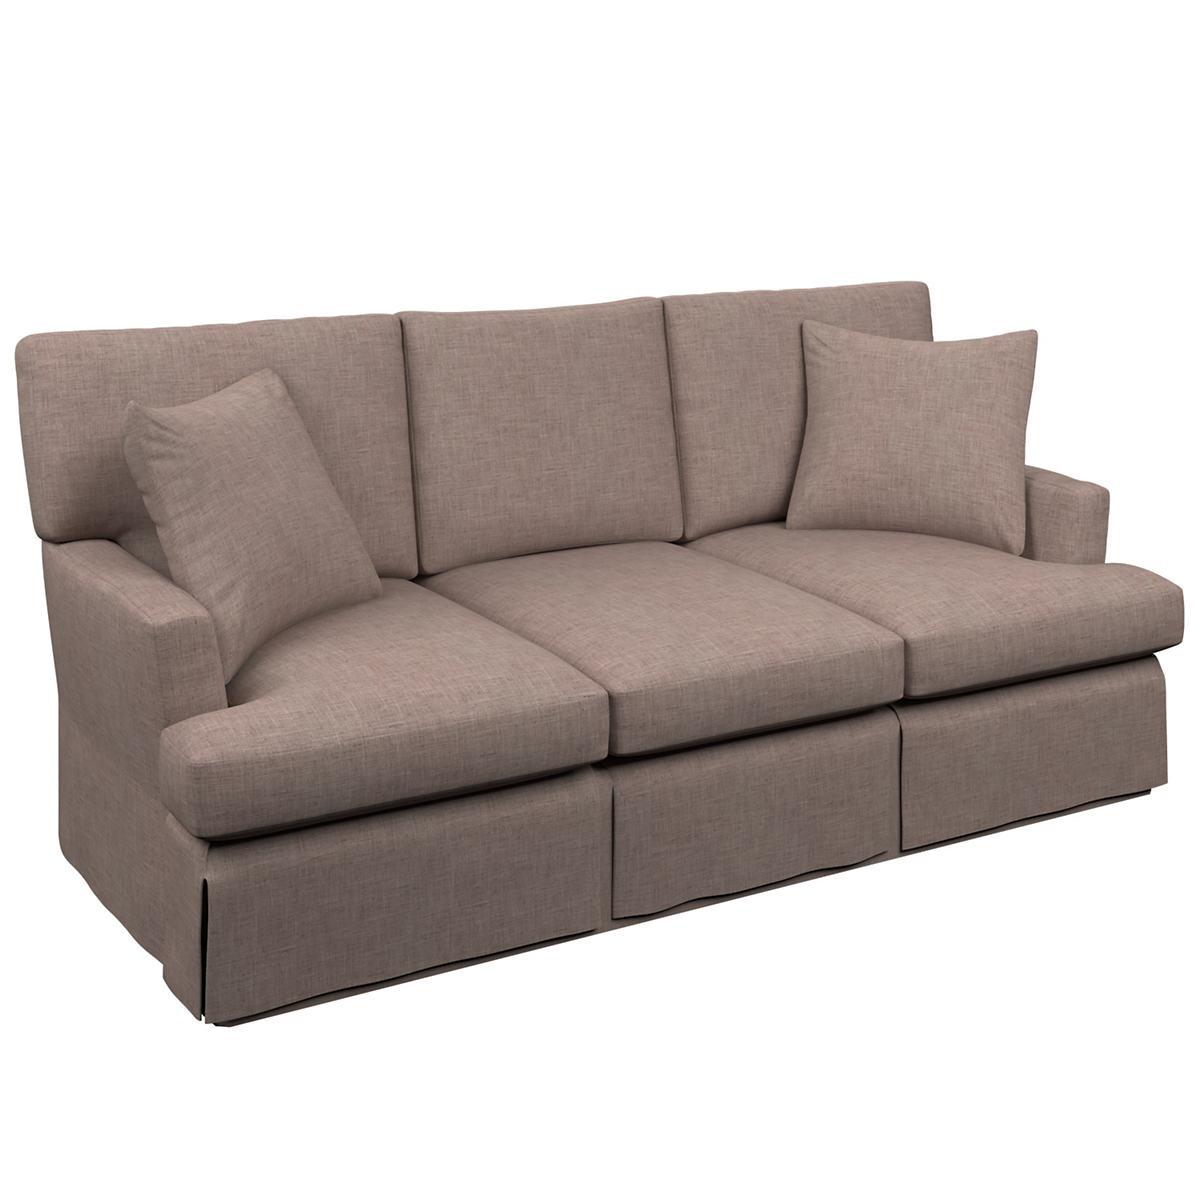 Canvasuede Heather Saybrook 3 Seater Slipcovered Sofa